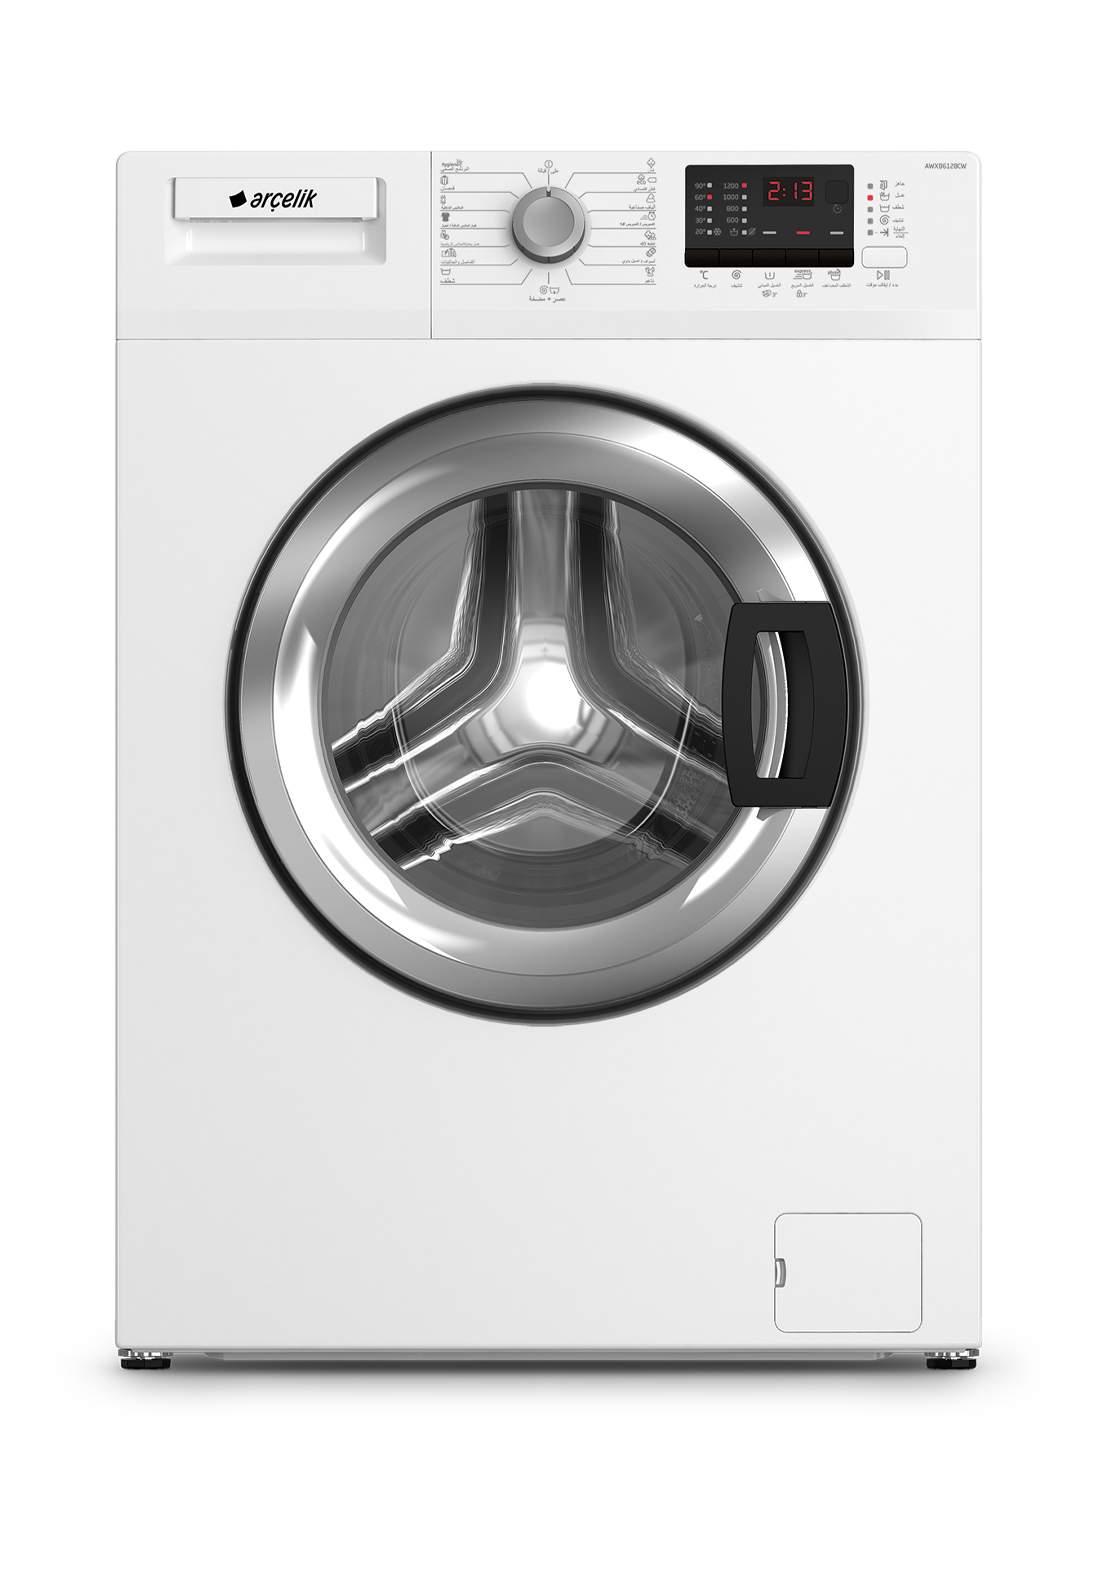 Arcelik AL 8100 D ALTUS Washing machine 8 kg gray غسالة 8 كيلو